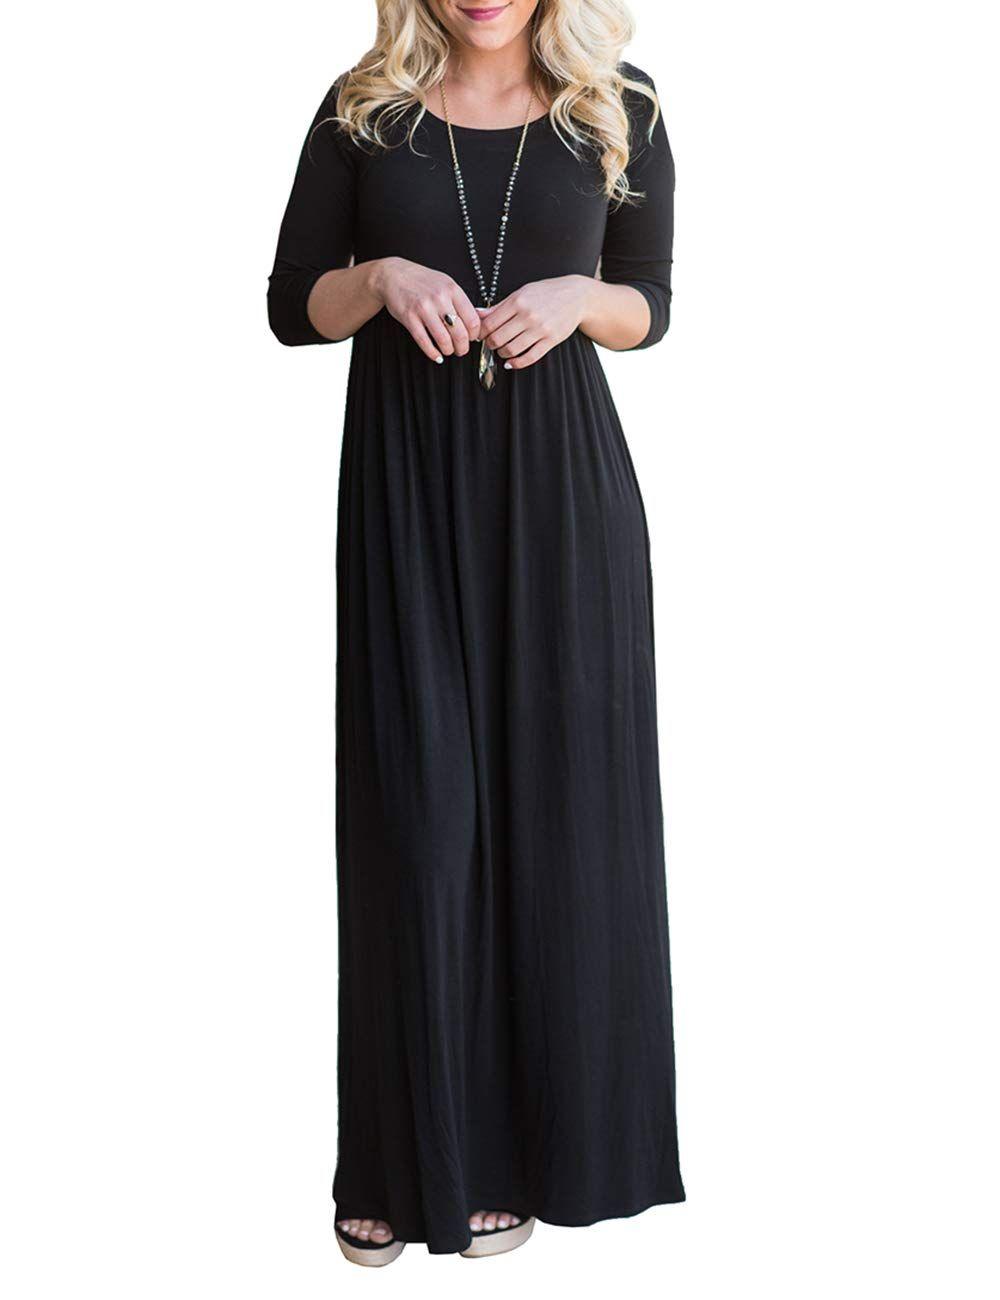 Dunea Women S Maxi Dress Floral Printed Autumn 3 4 Sleeve Casual Tunic Long Maxi Dress Dresses Dr Party Dress Long Sleeve Long Maxi Dress Womens Maxi Dresses [ 1300 x 1000 Pixel ]